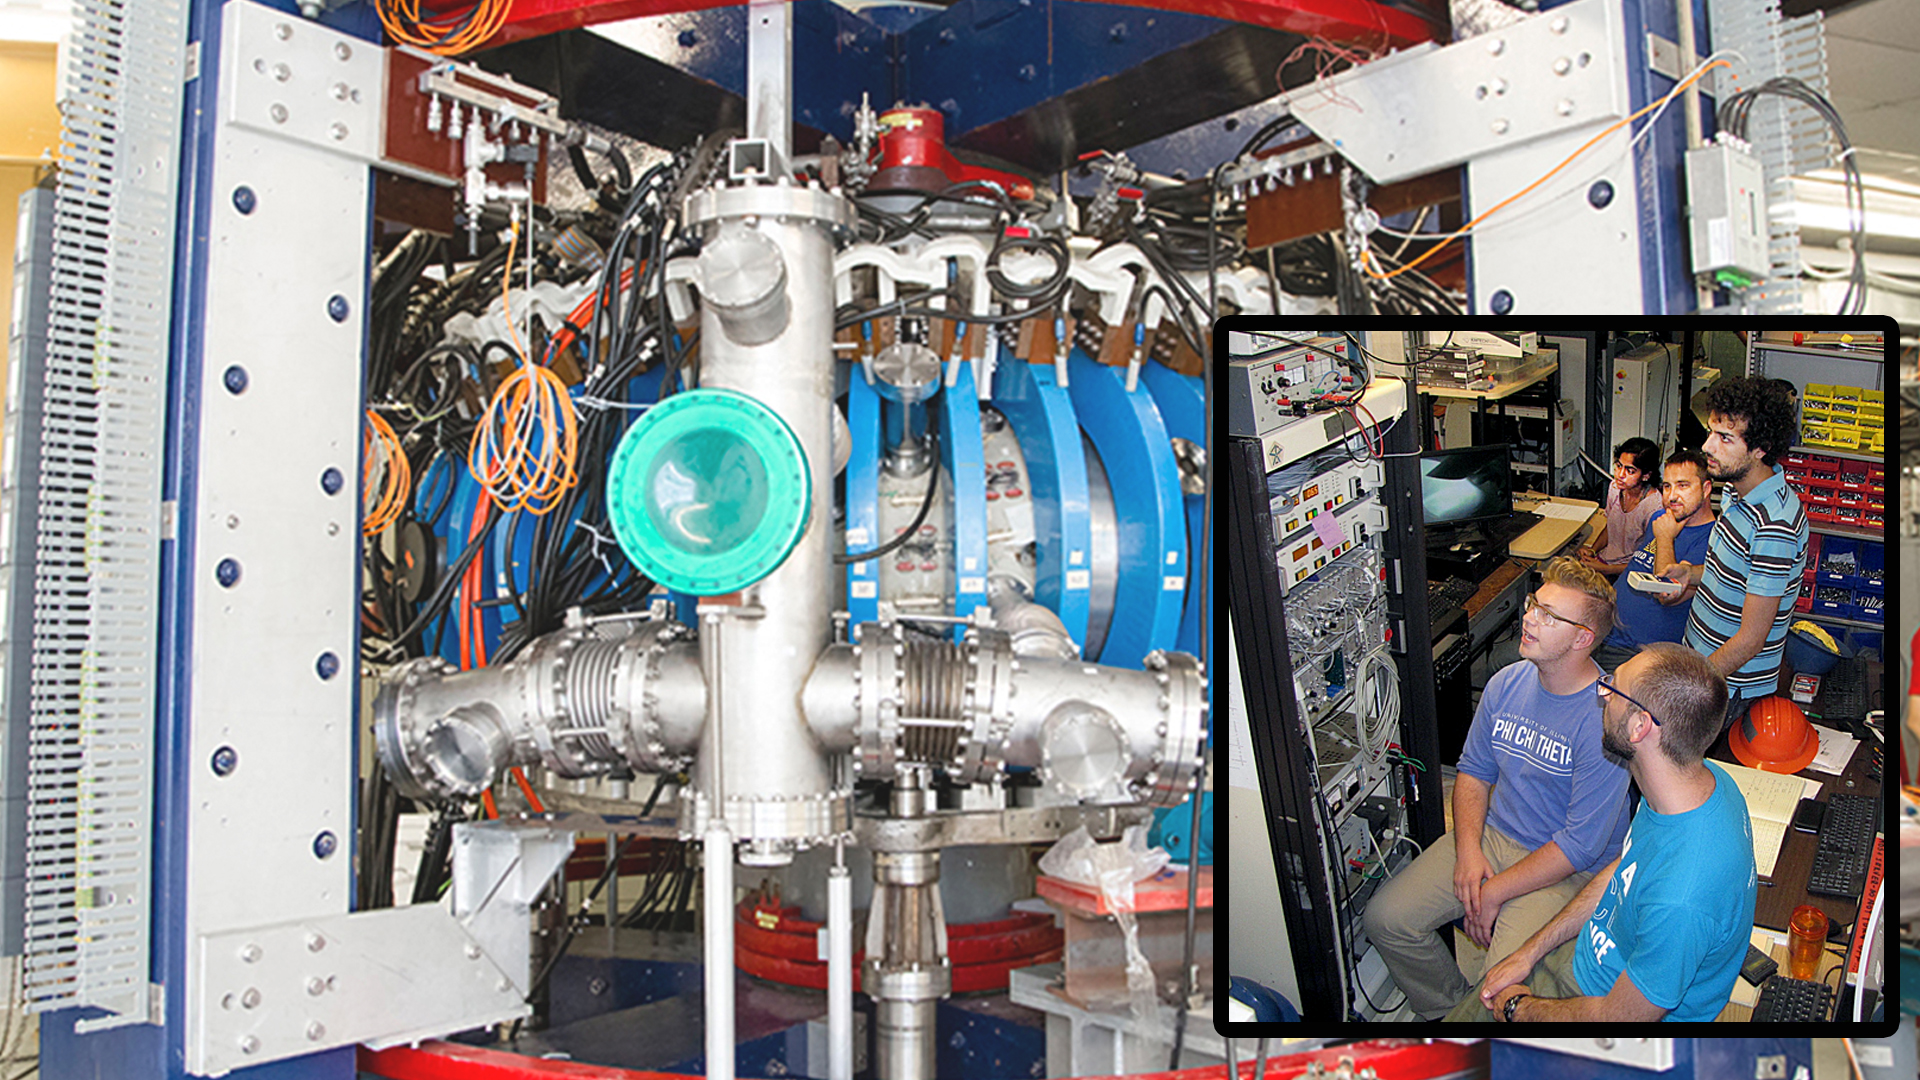 CPMI researchers prepare HIDRA to test liquid lithium fusion reactor experiments